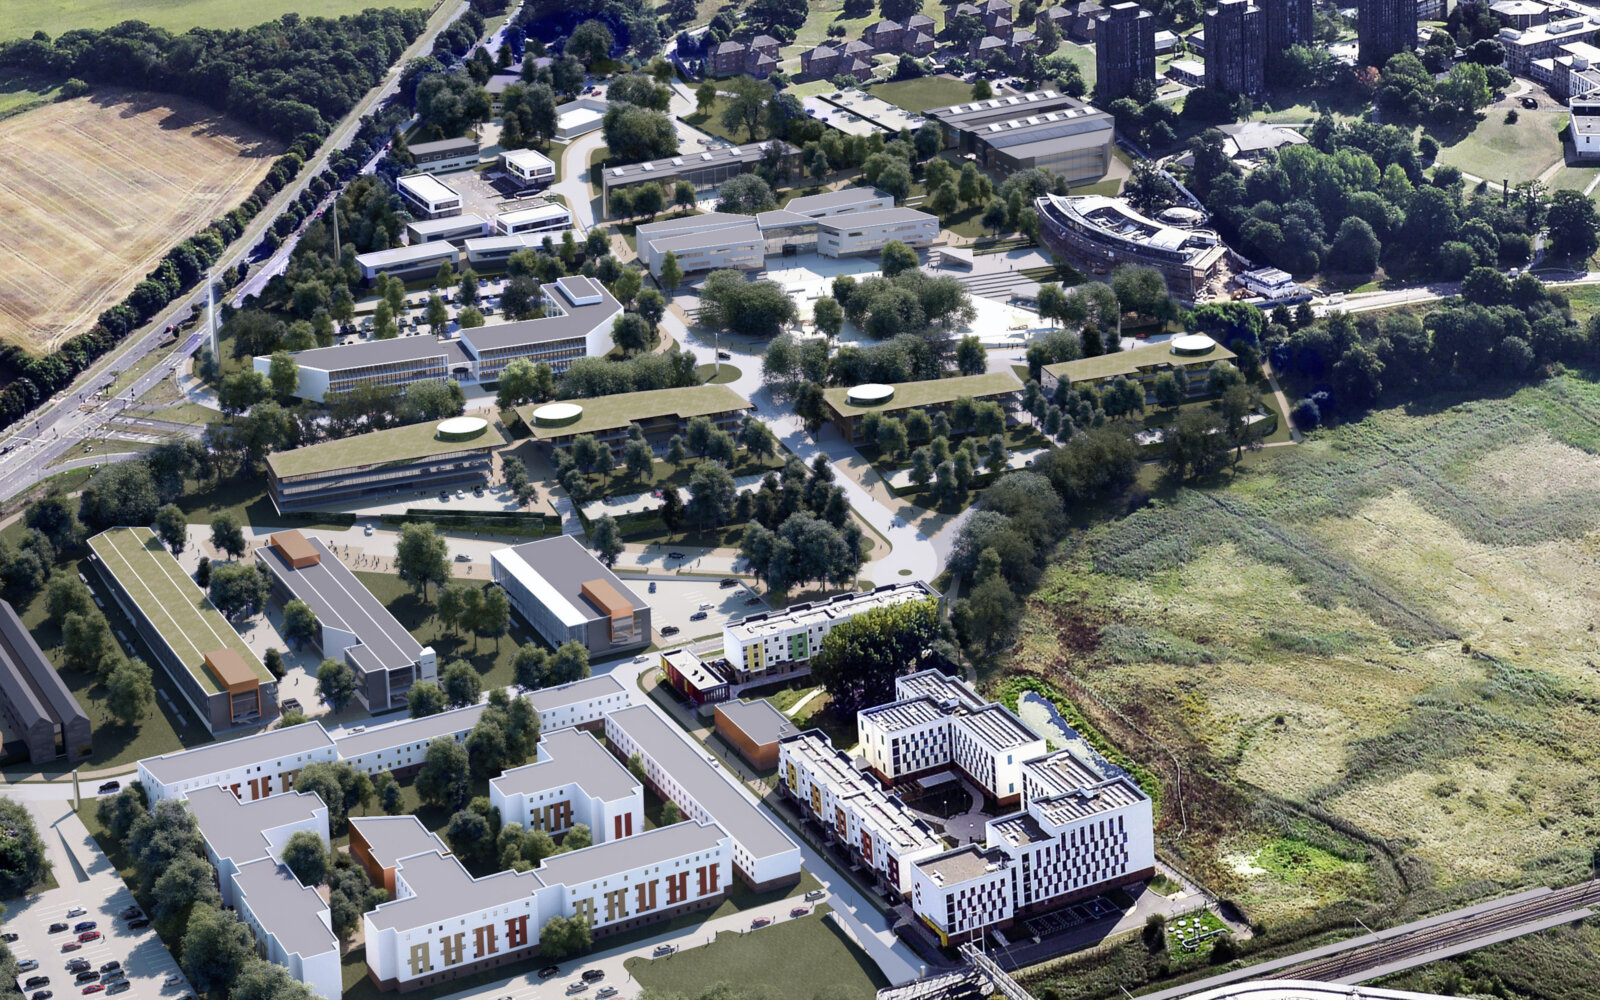 University of Essex aerial view